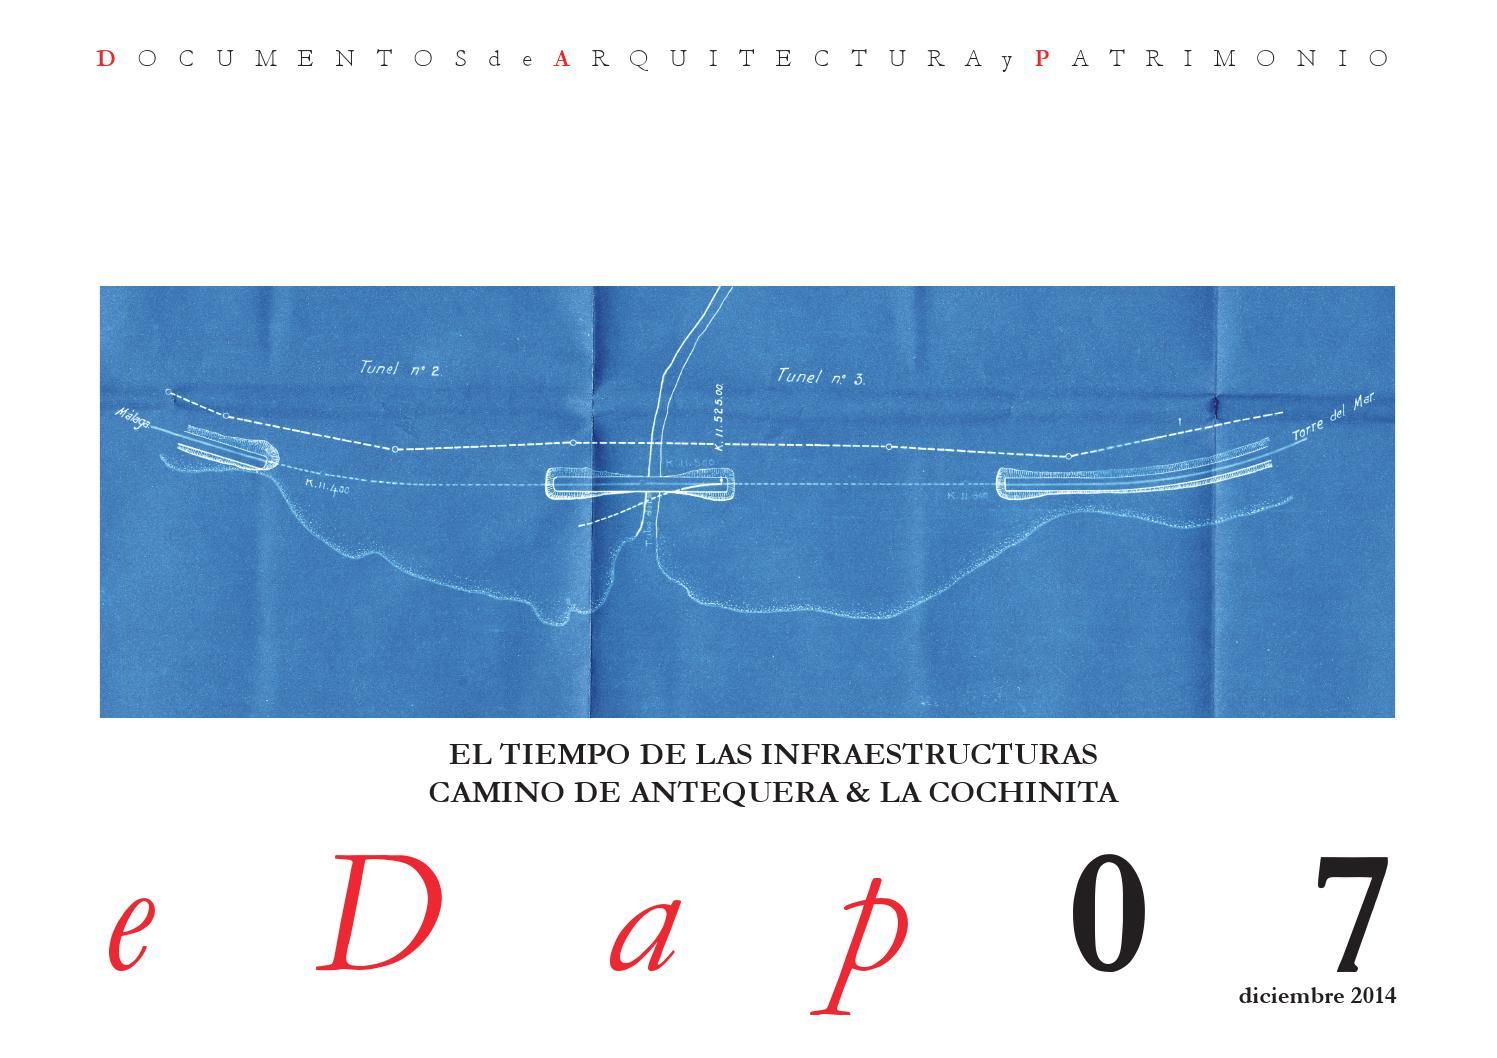 Edap07 eltiempodelasinfraestructuras by Ferran Ventura - issuu